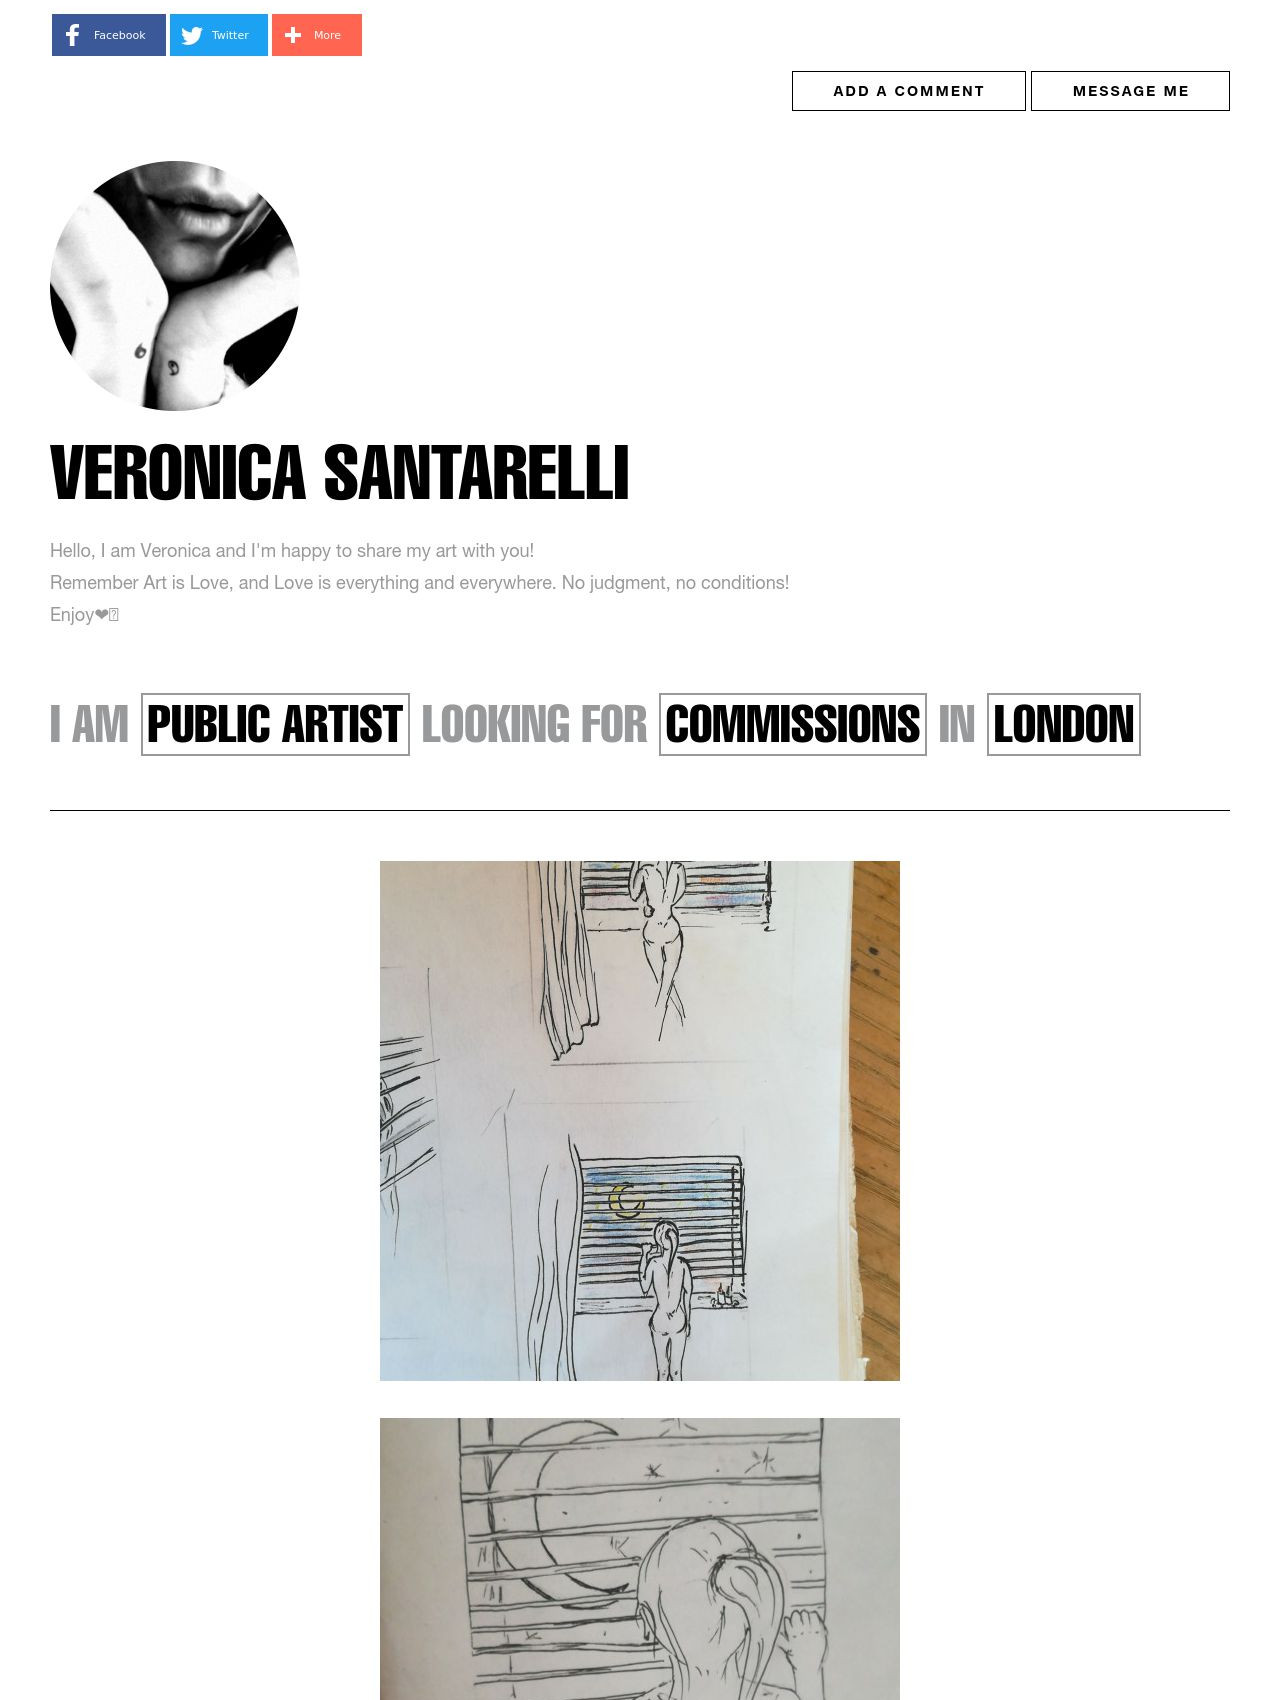 Veronica Santarelli